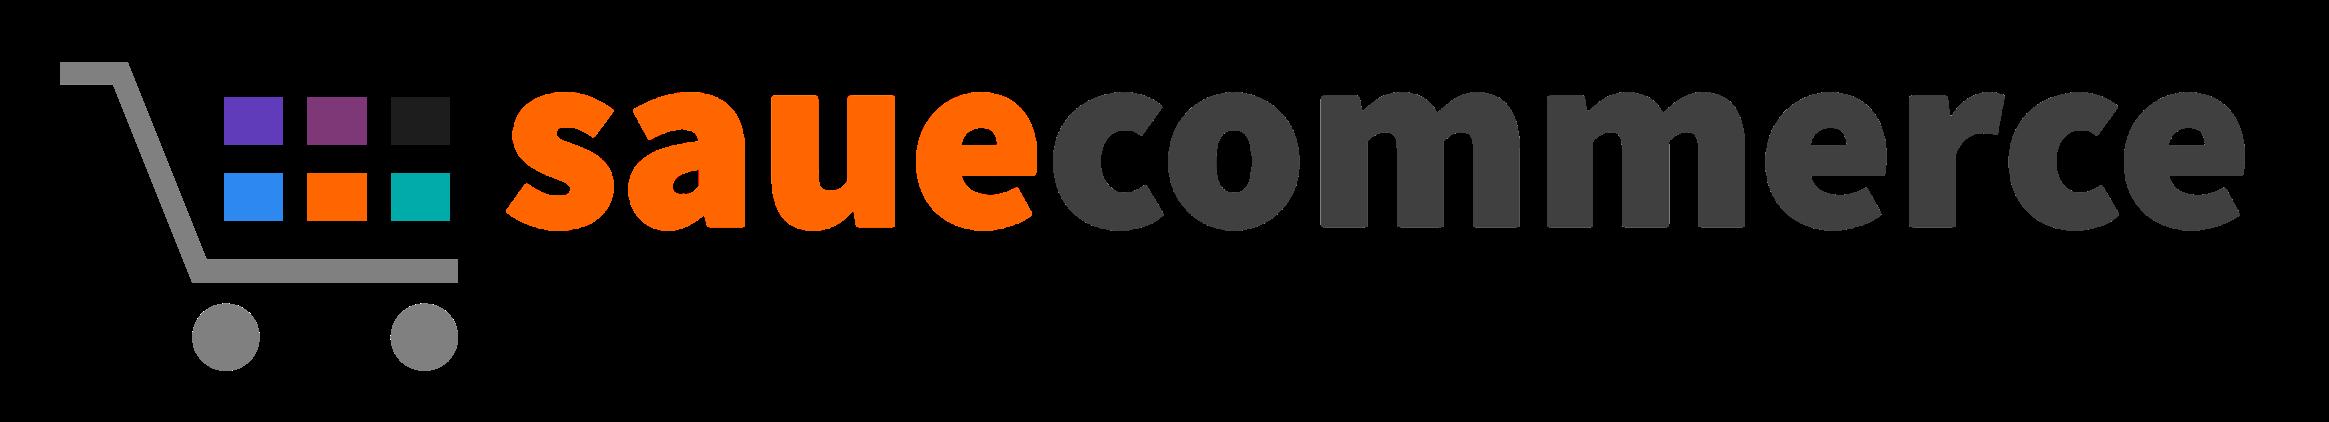 SAUECOMMERCE logo